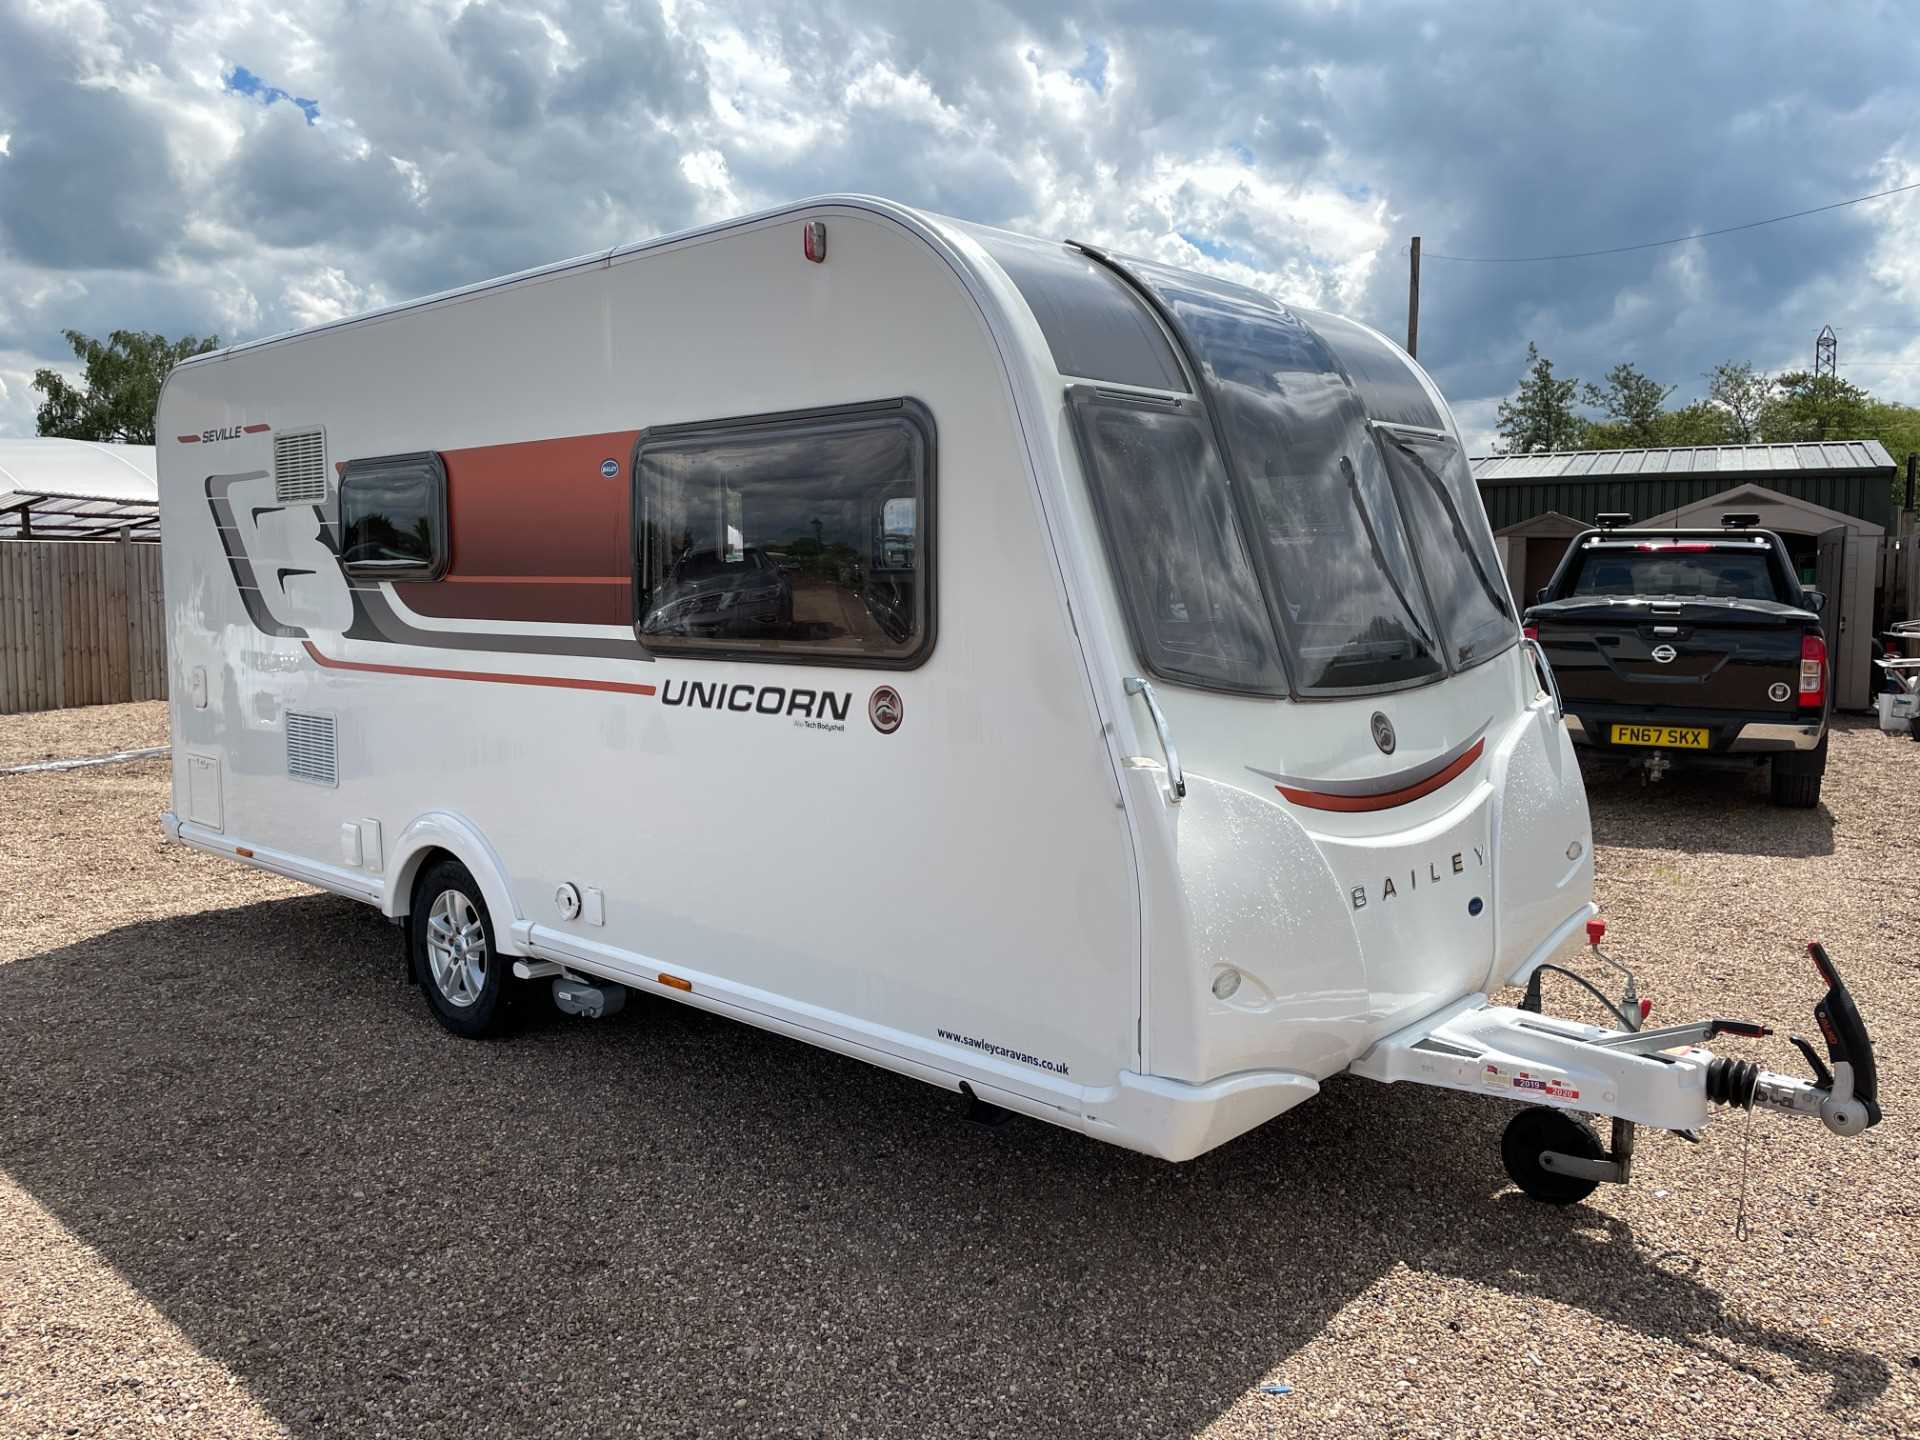 Sawley Caravans Models Currently Stocked Bailey Elddis Ford Vauxhall Nissan